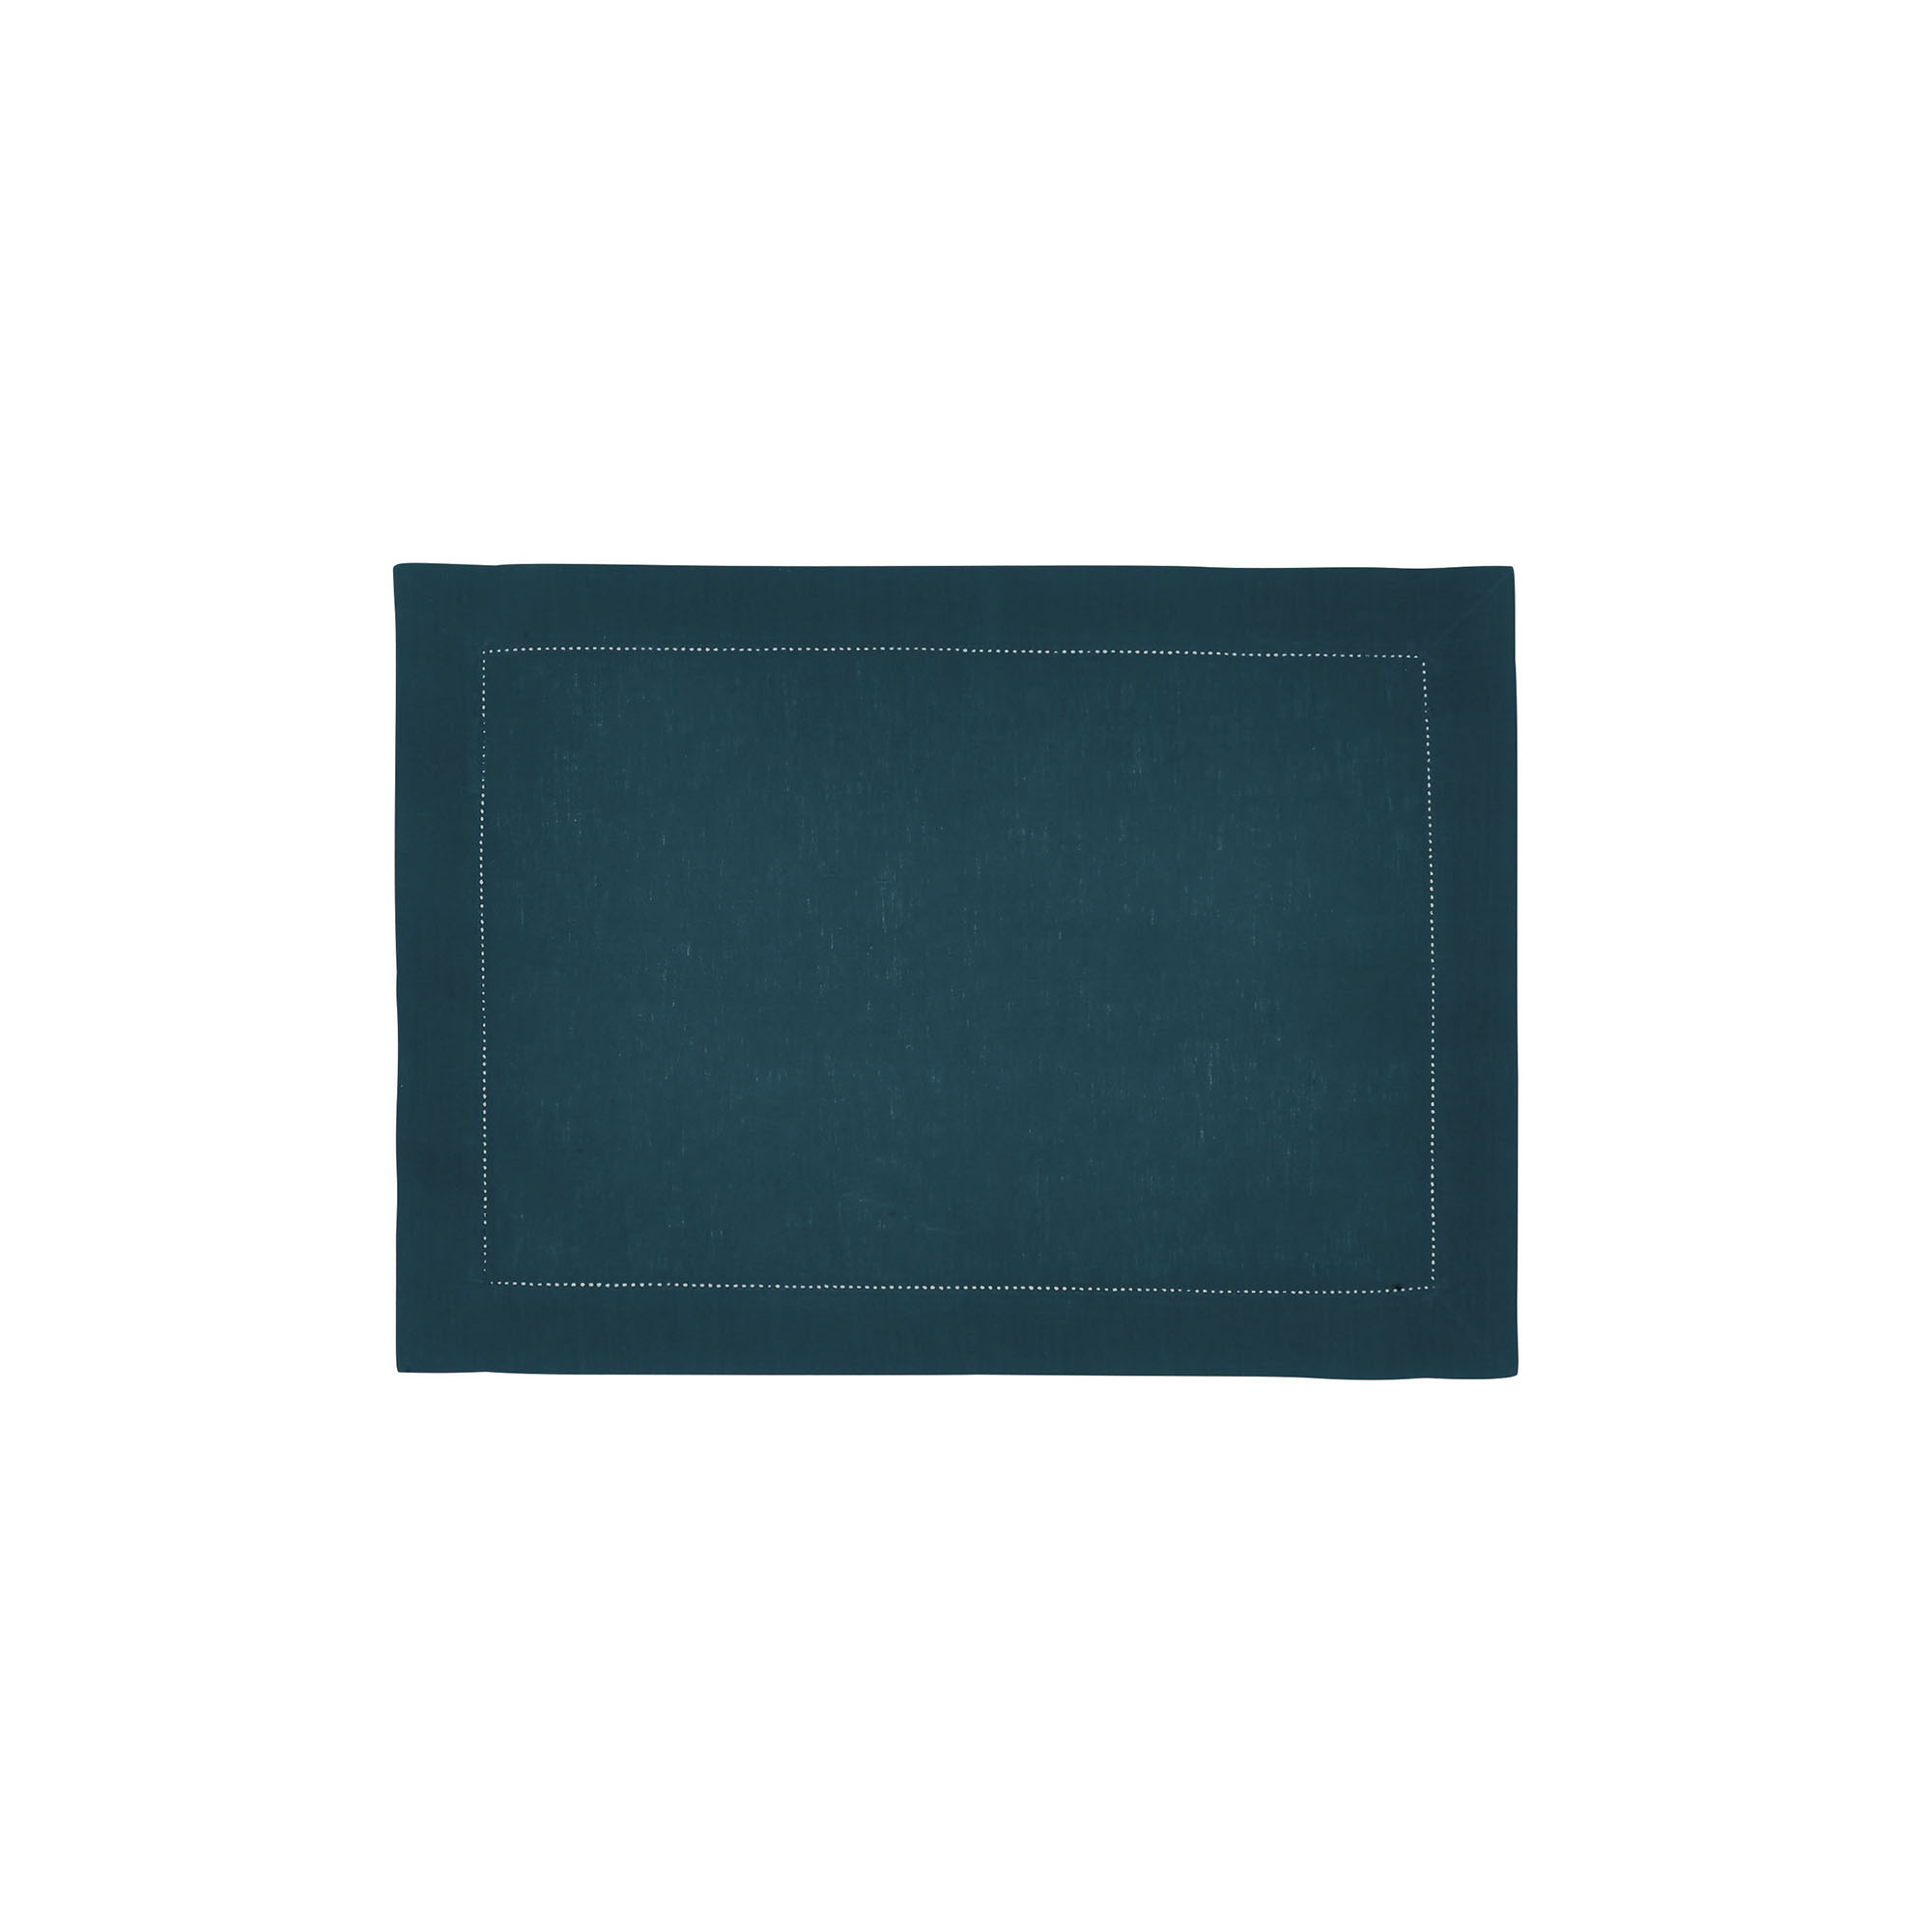 Set de table en lin vert cyprès 37x50